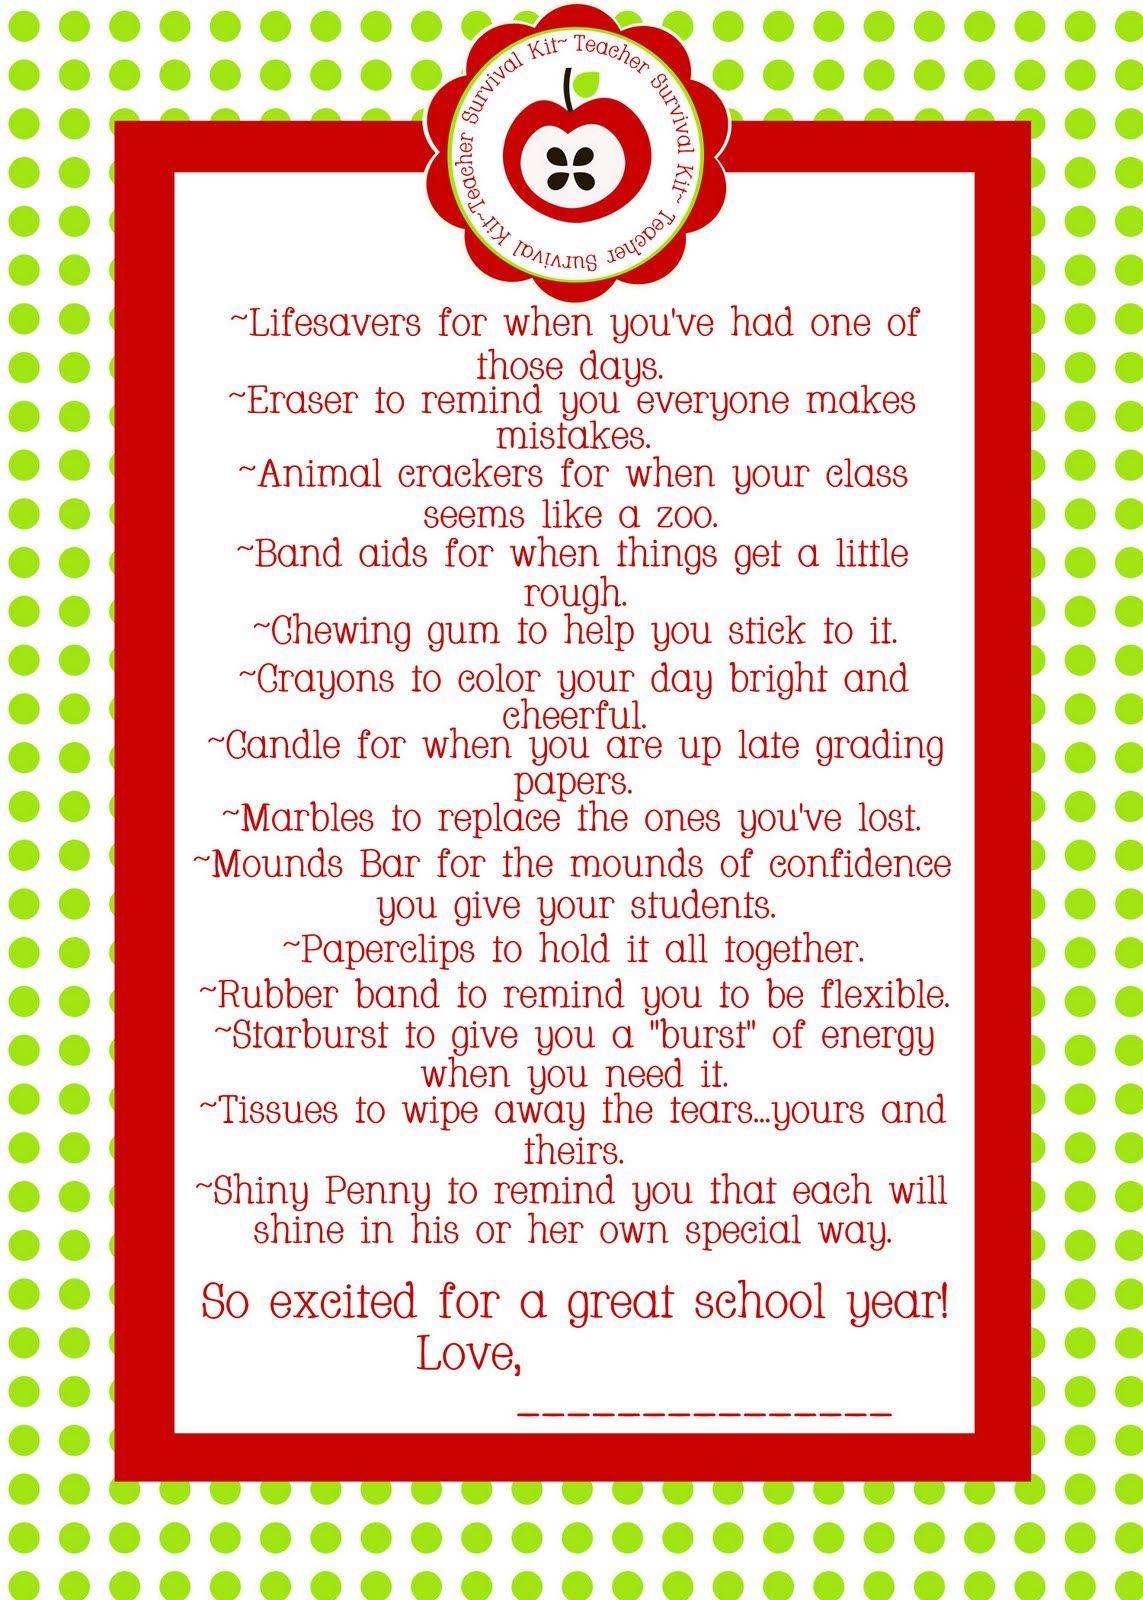 Paperlicious Girls: Free Printable~Teacher Survival Kit | Teacher - Teacher Survival Kit Free Printable